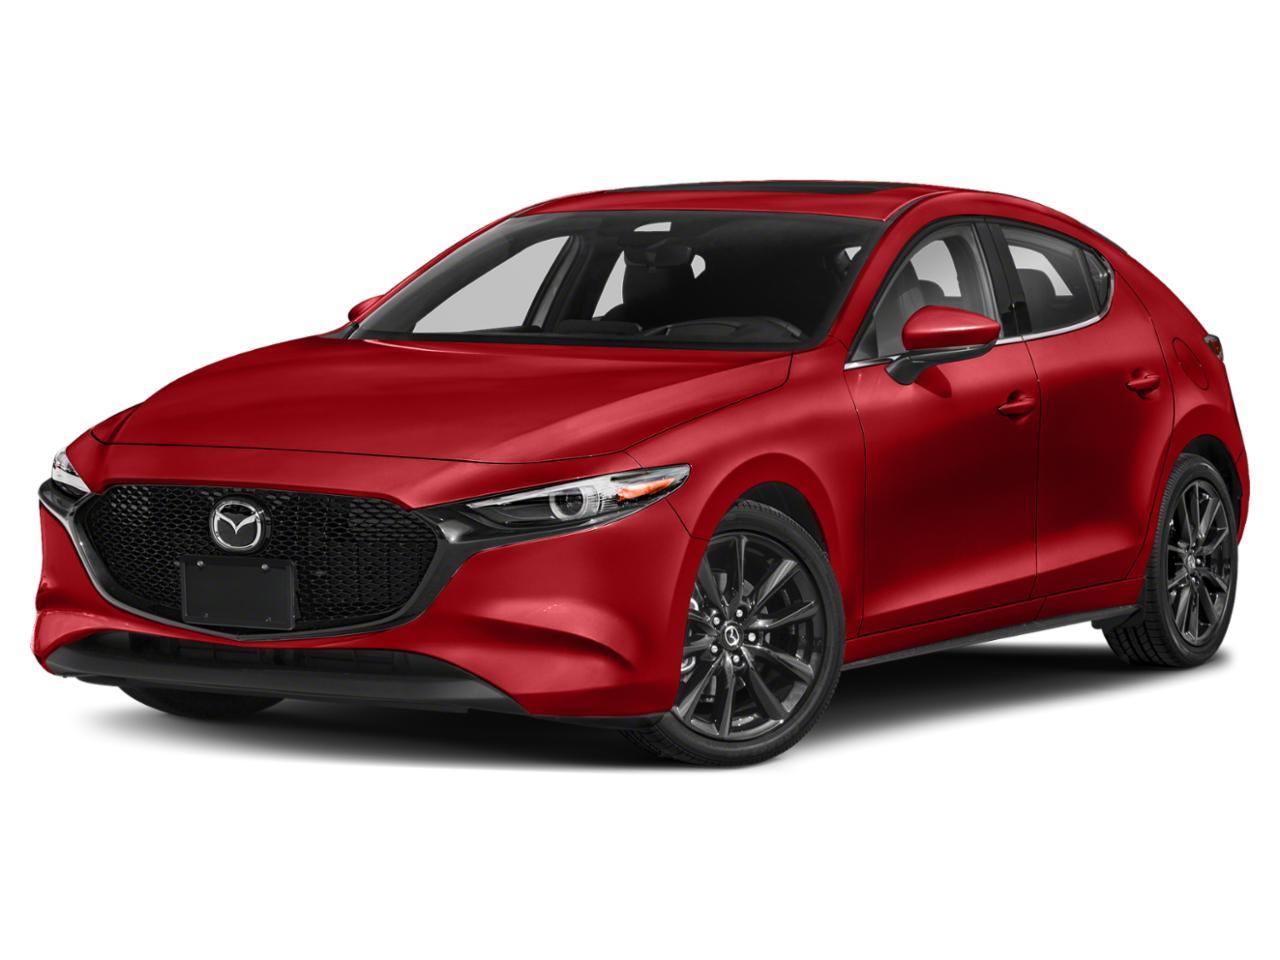 2019 Mazda Mazda3 Hatchback Vehicle Photo in Manassas, VA 20109